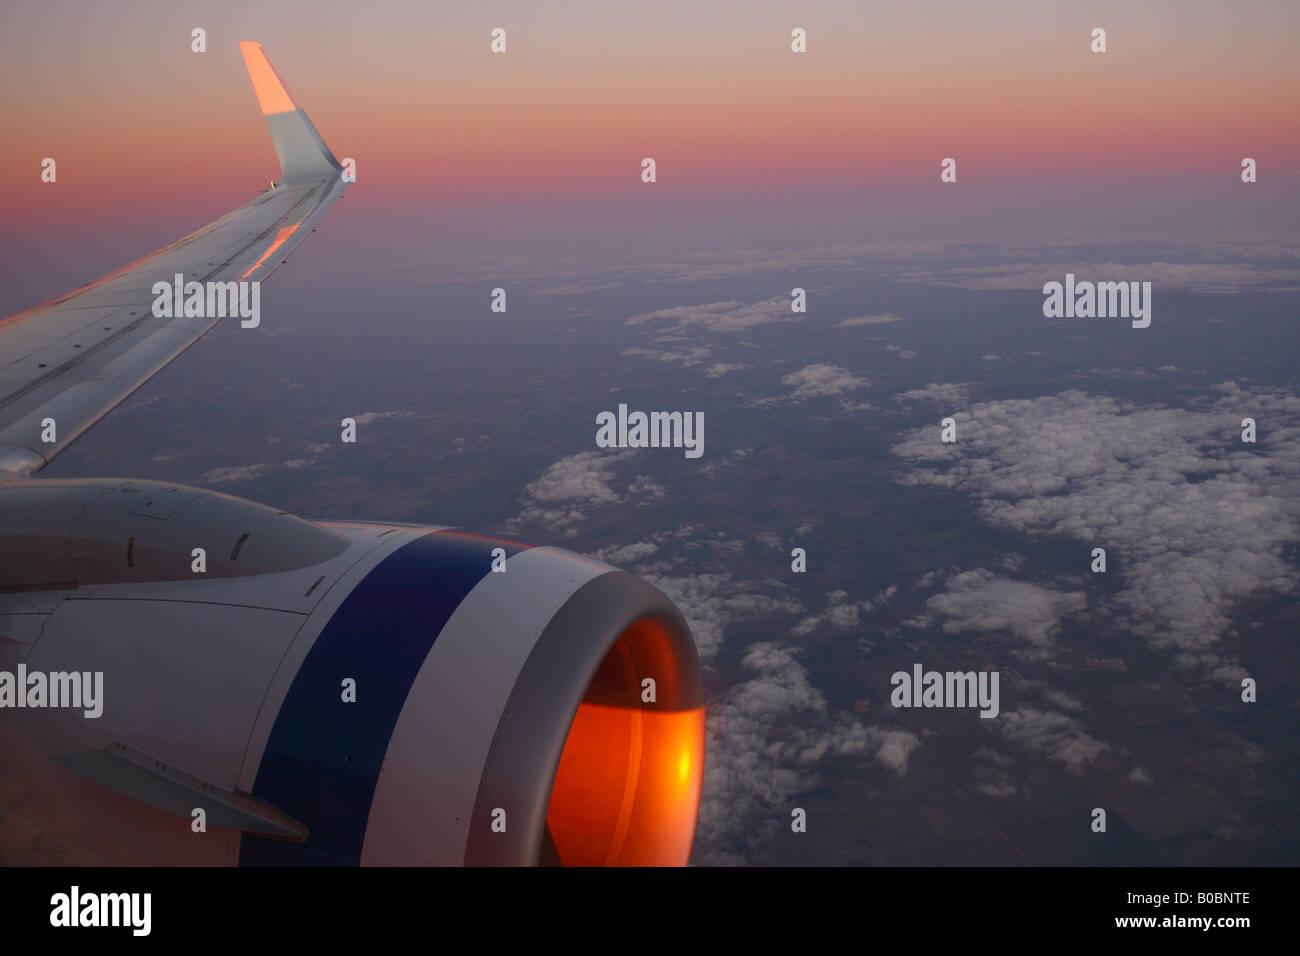 Airbus sunset flight - Stock Image